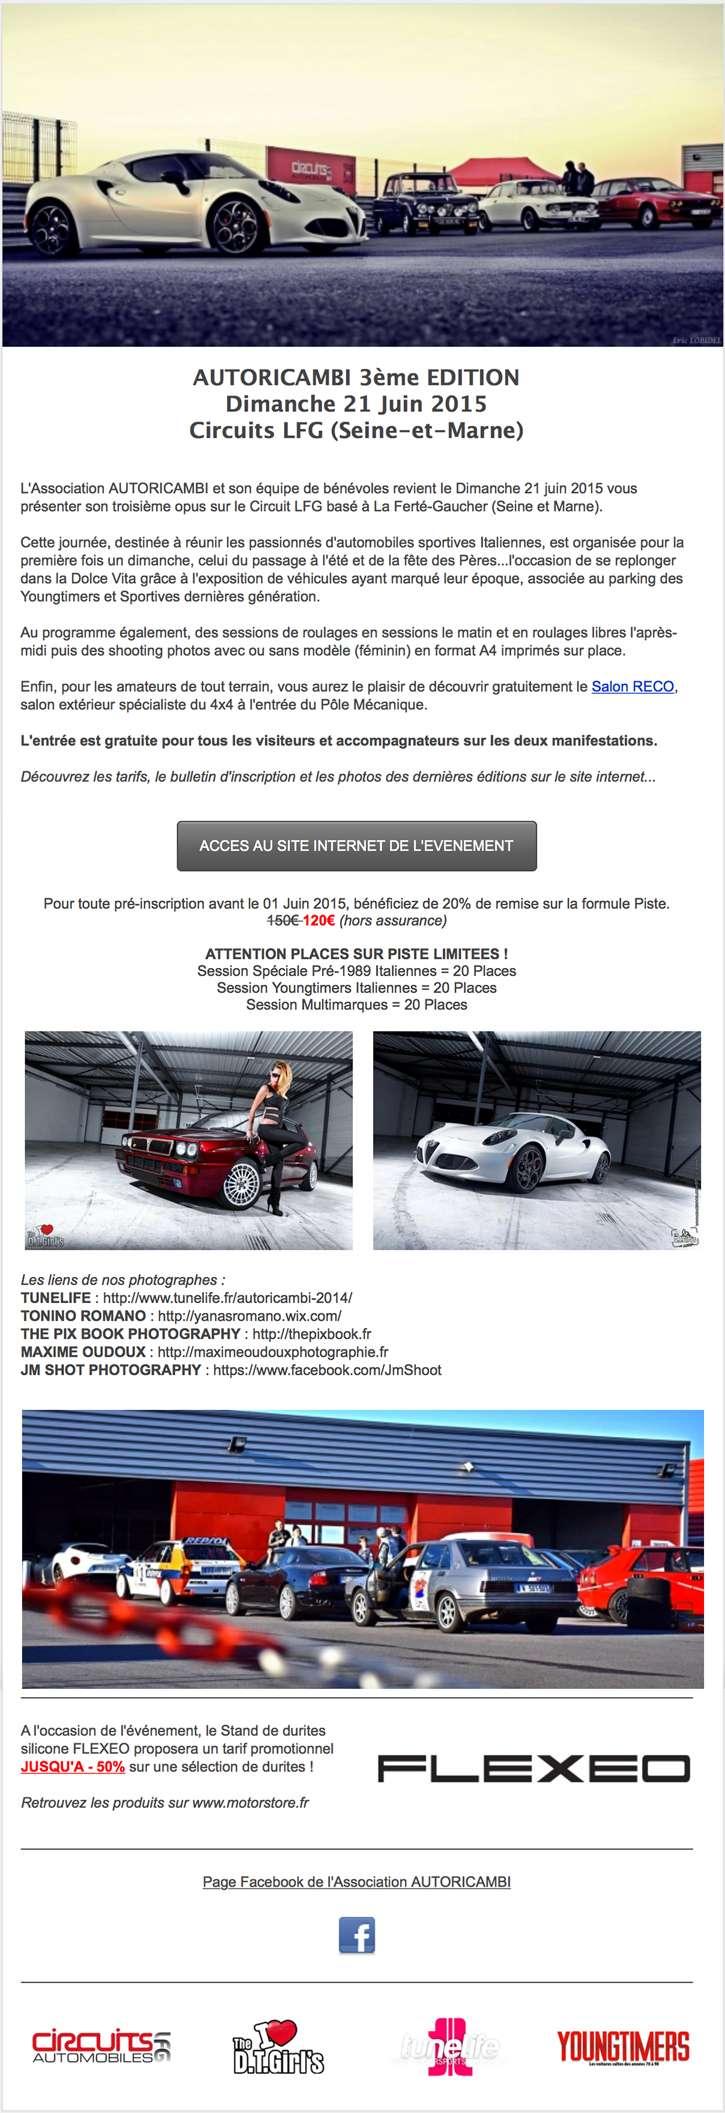 Circuit LFG - AUTORICAMBI Edition 3 // Dimanche 21 Juin 2015 Newsle10